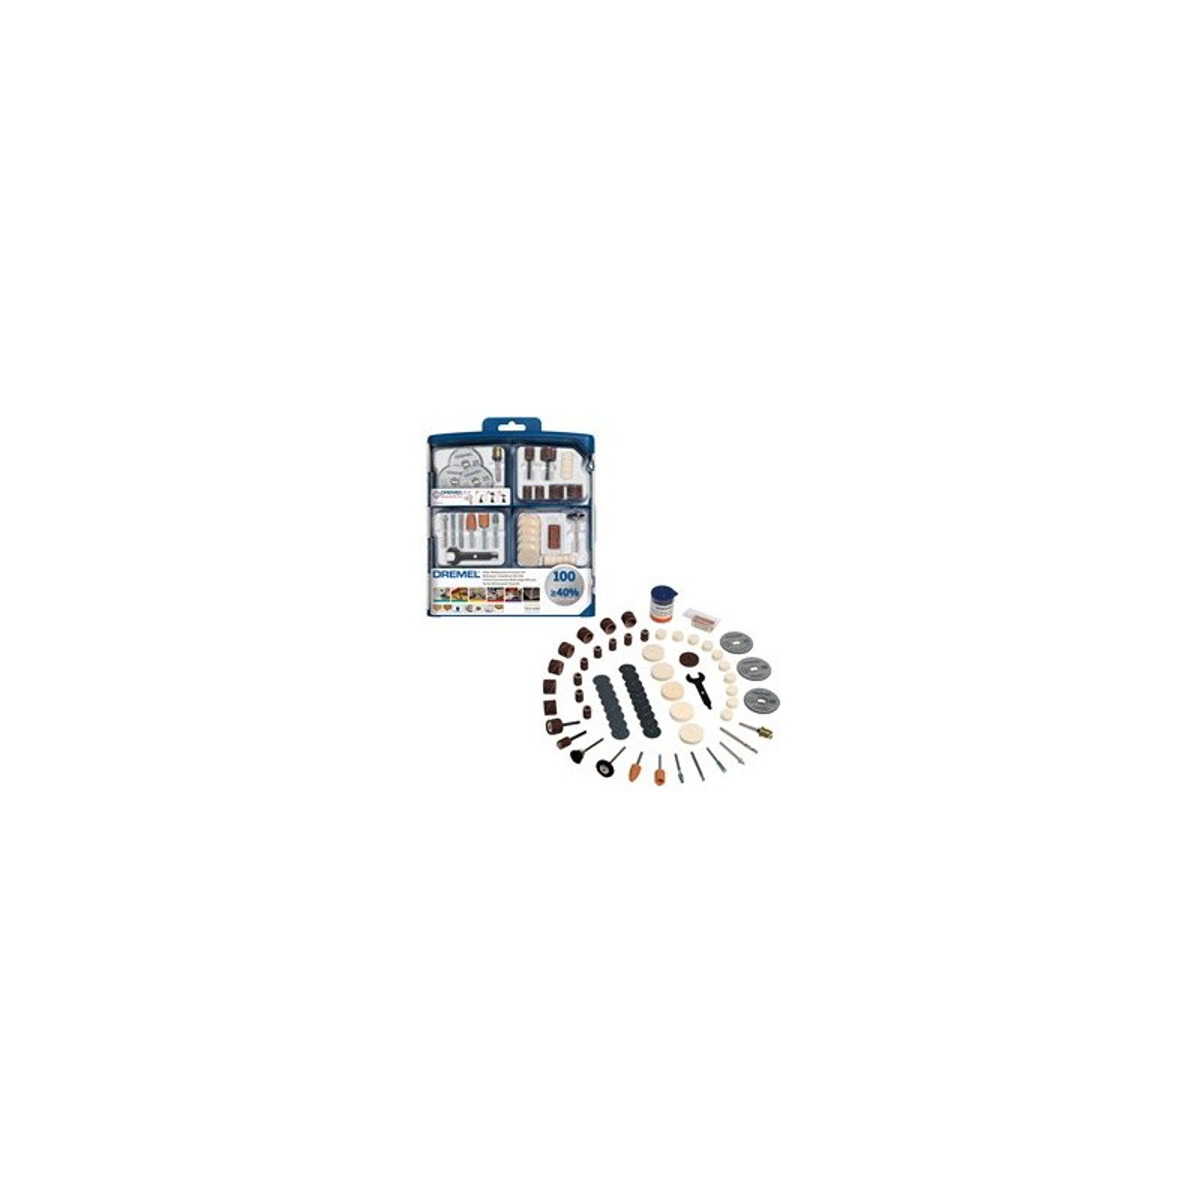 DREMEL 100 pieces Multipurpose Accessory Set 723 2615S723JA